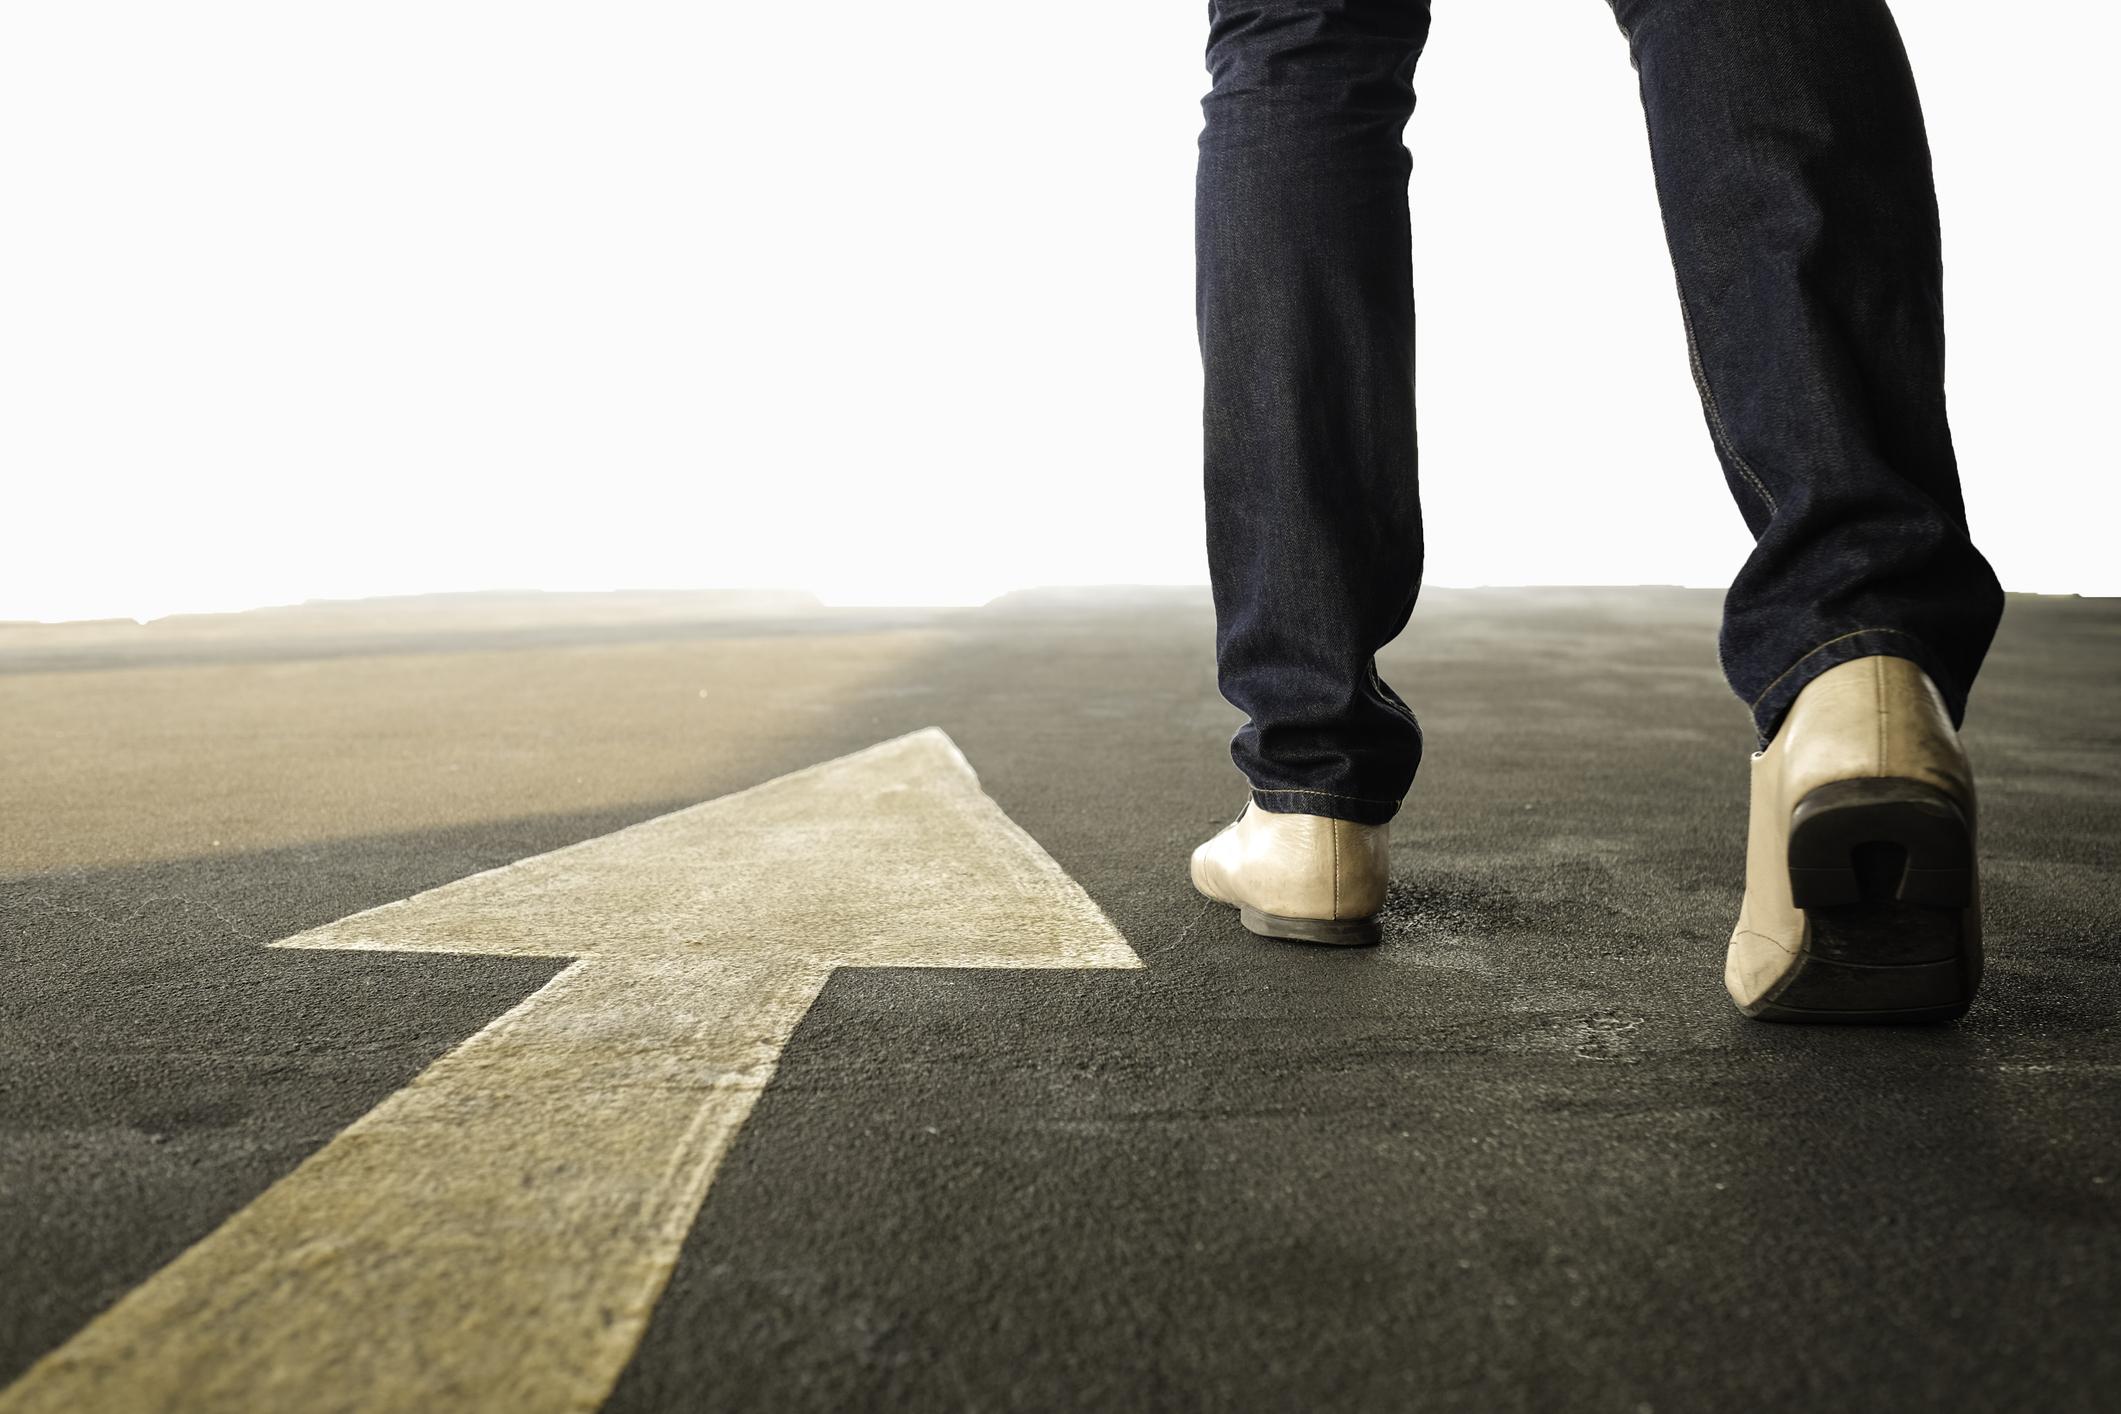 Concept of a man follows the right way